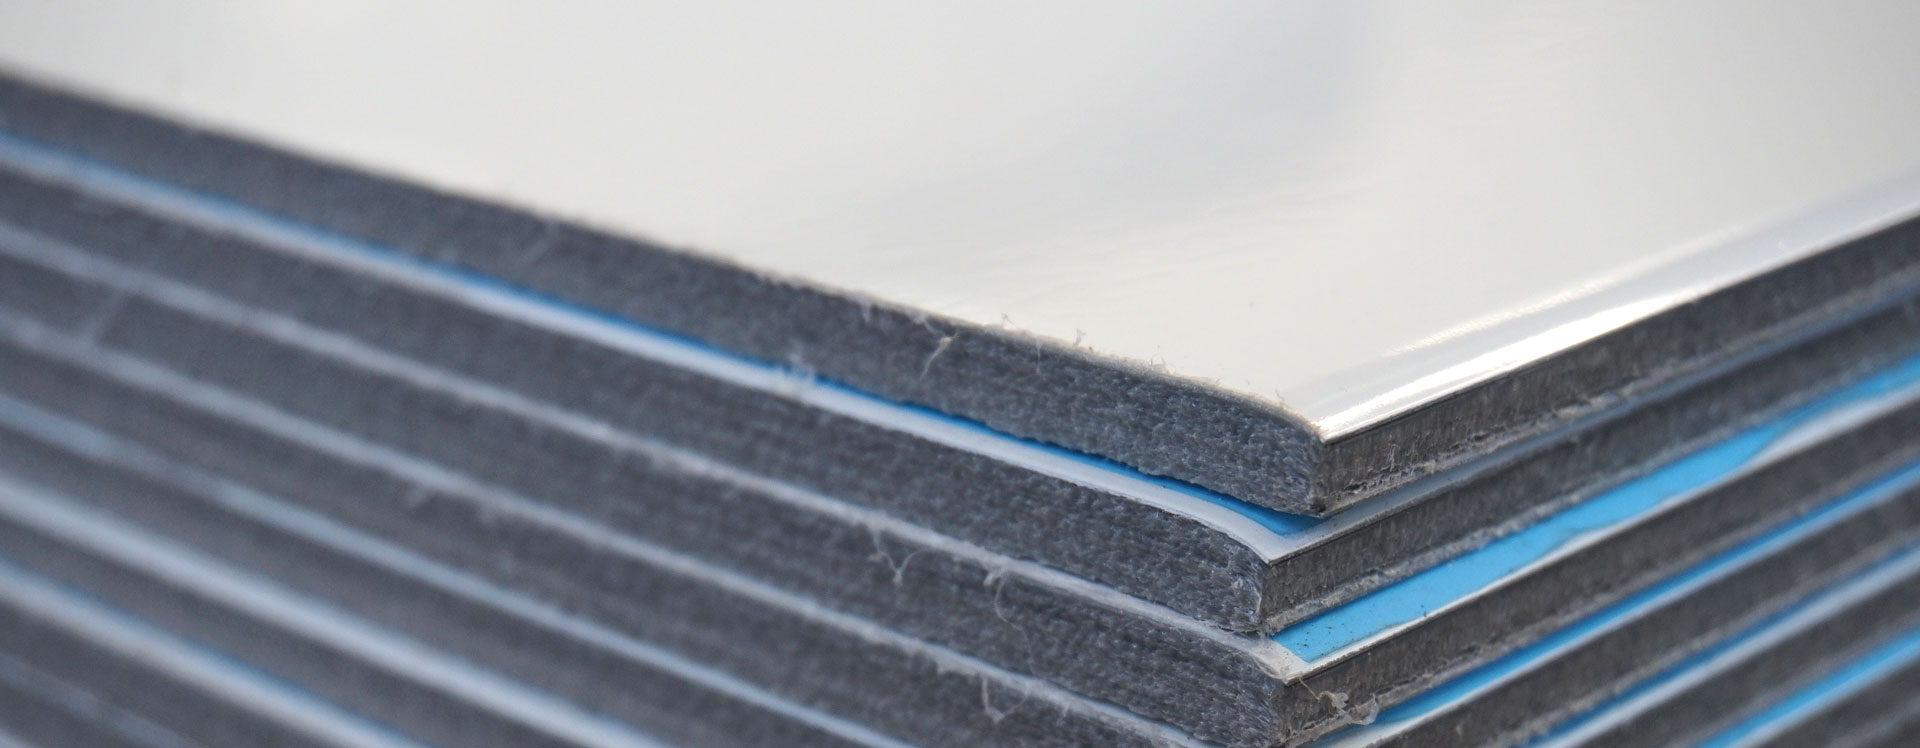 Blade Panels